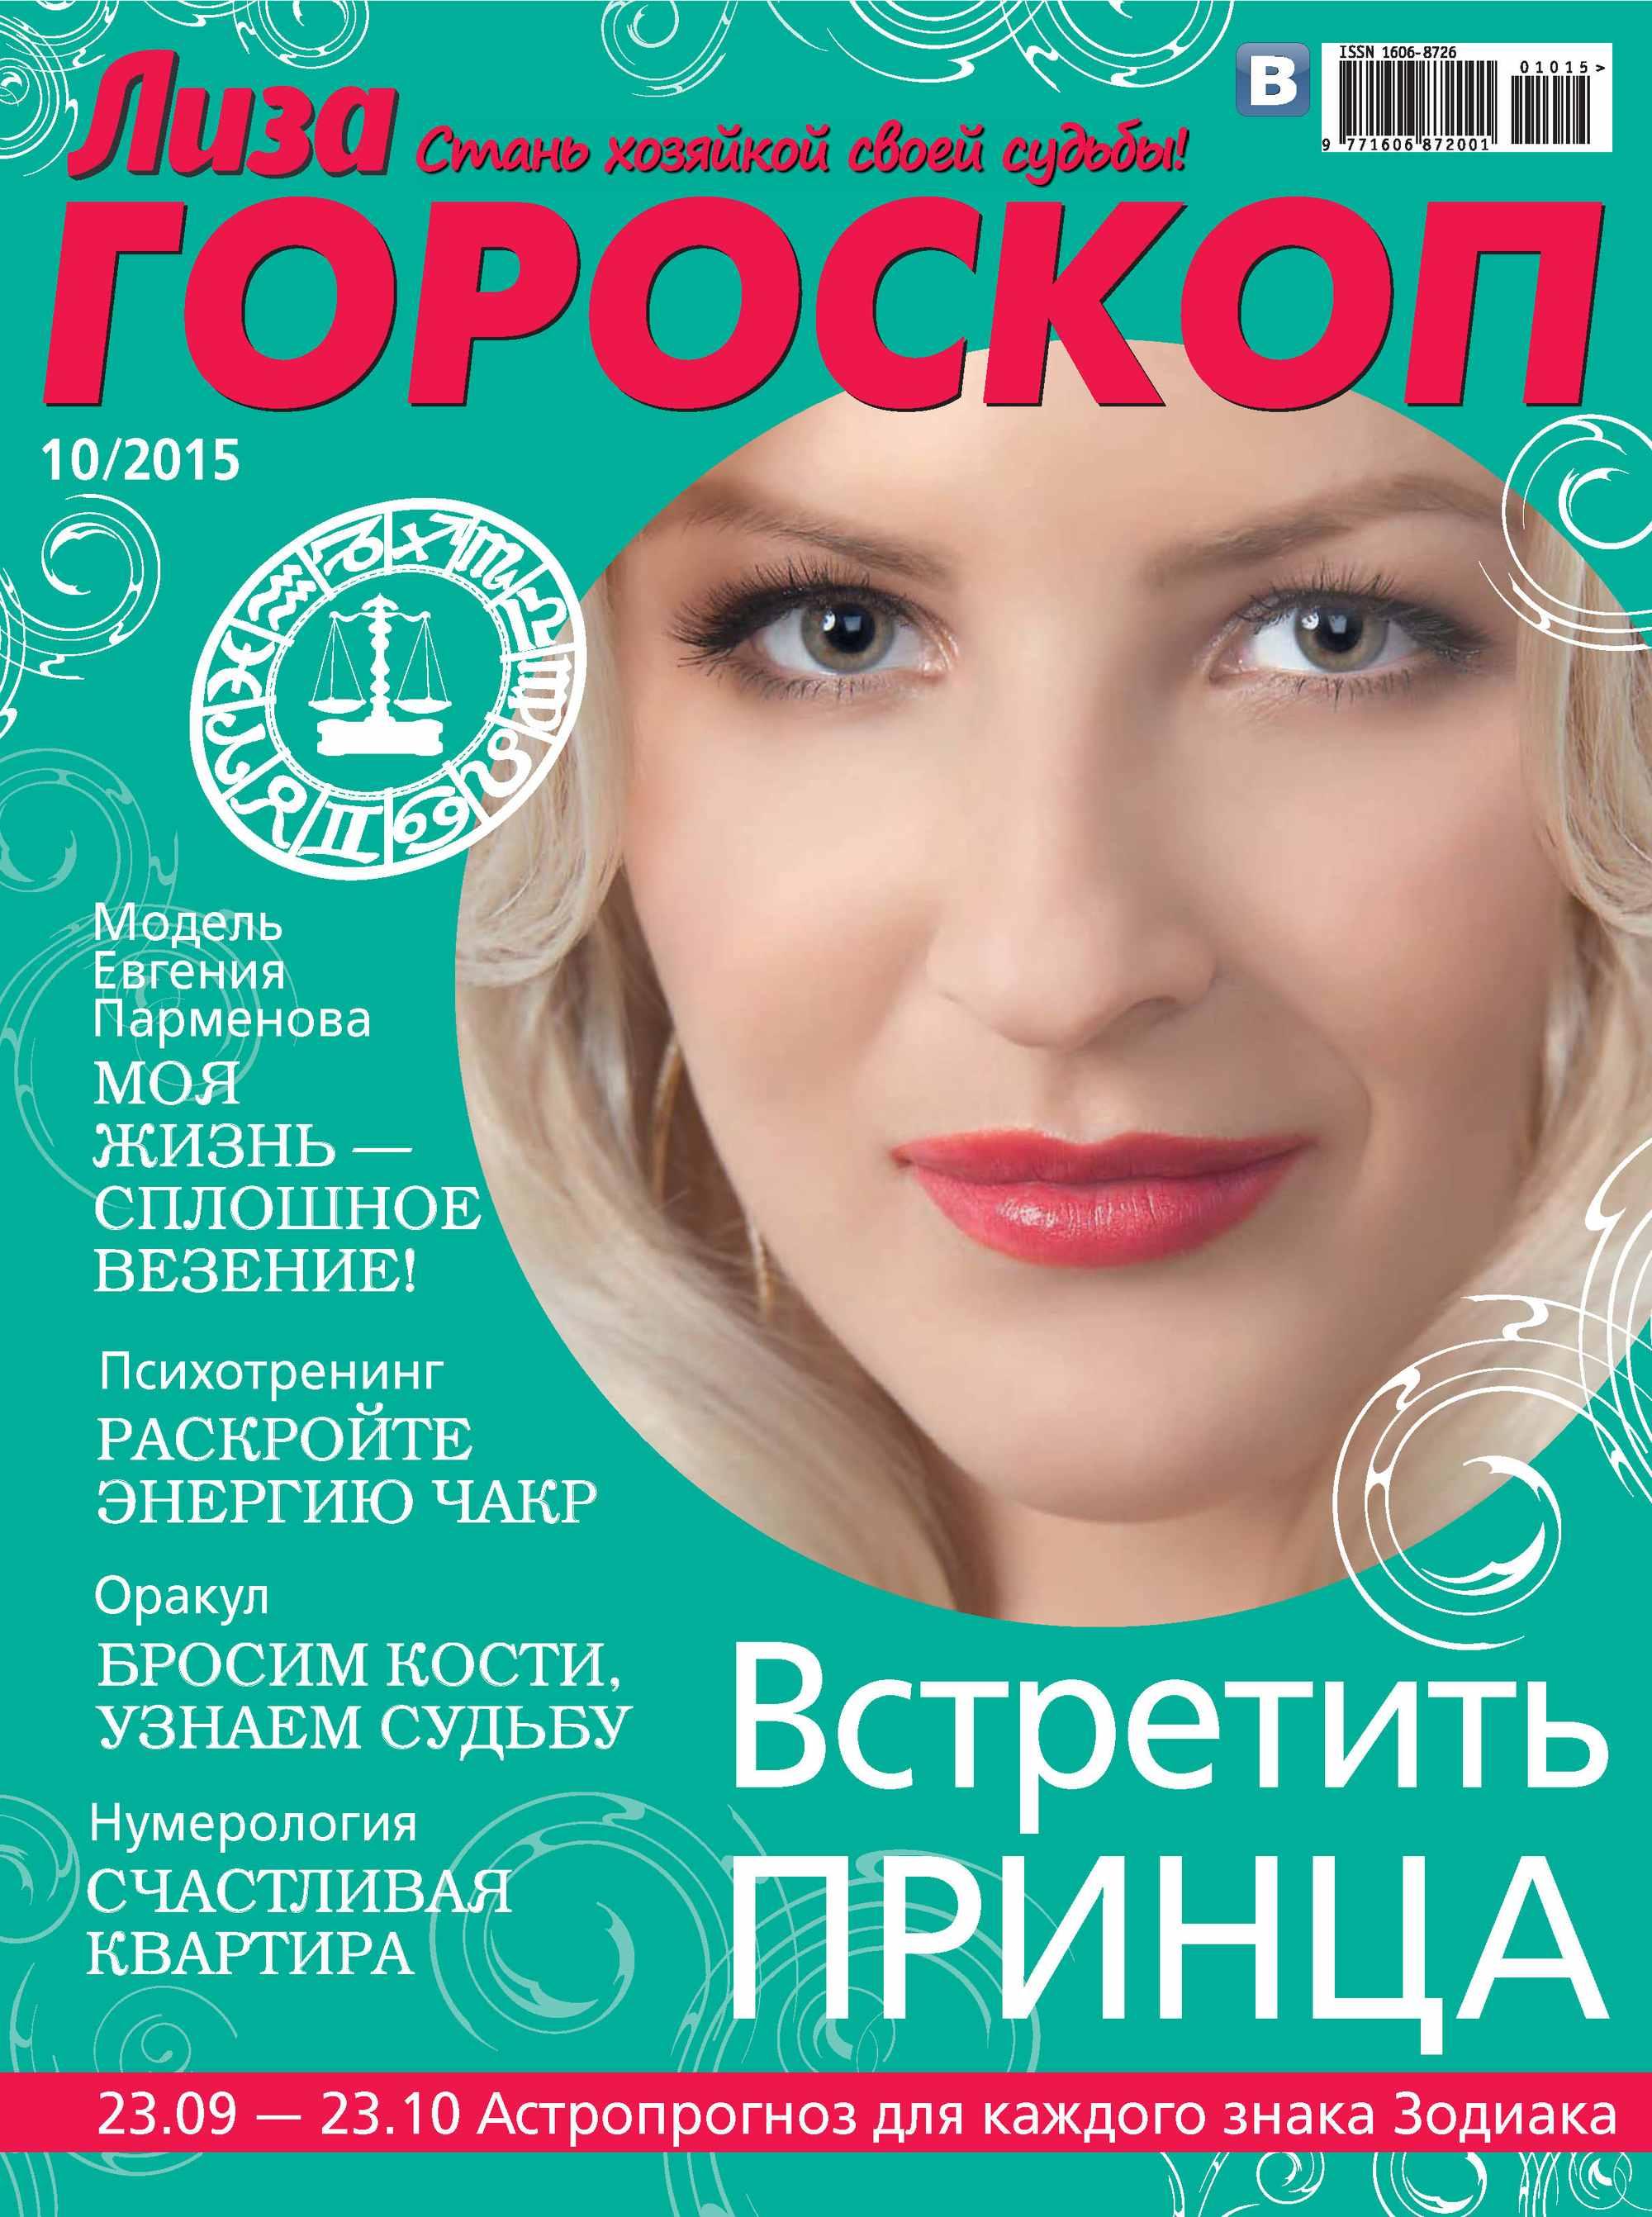 ИД «Бурда» Журнал «Лиза. Гороскоп» №10/2015 цена